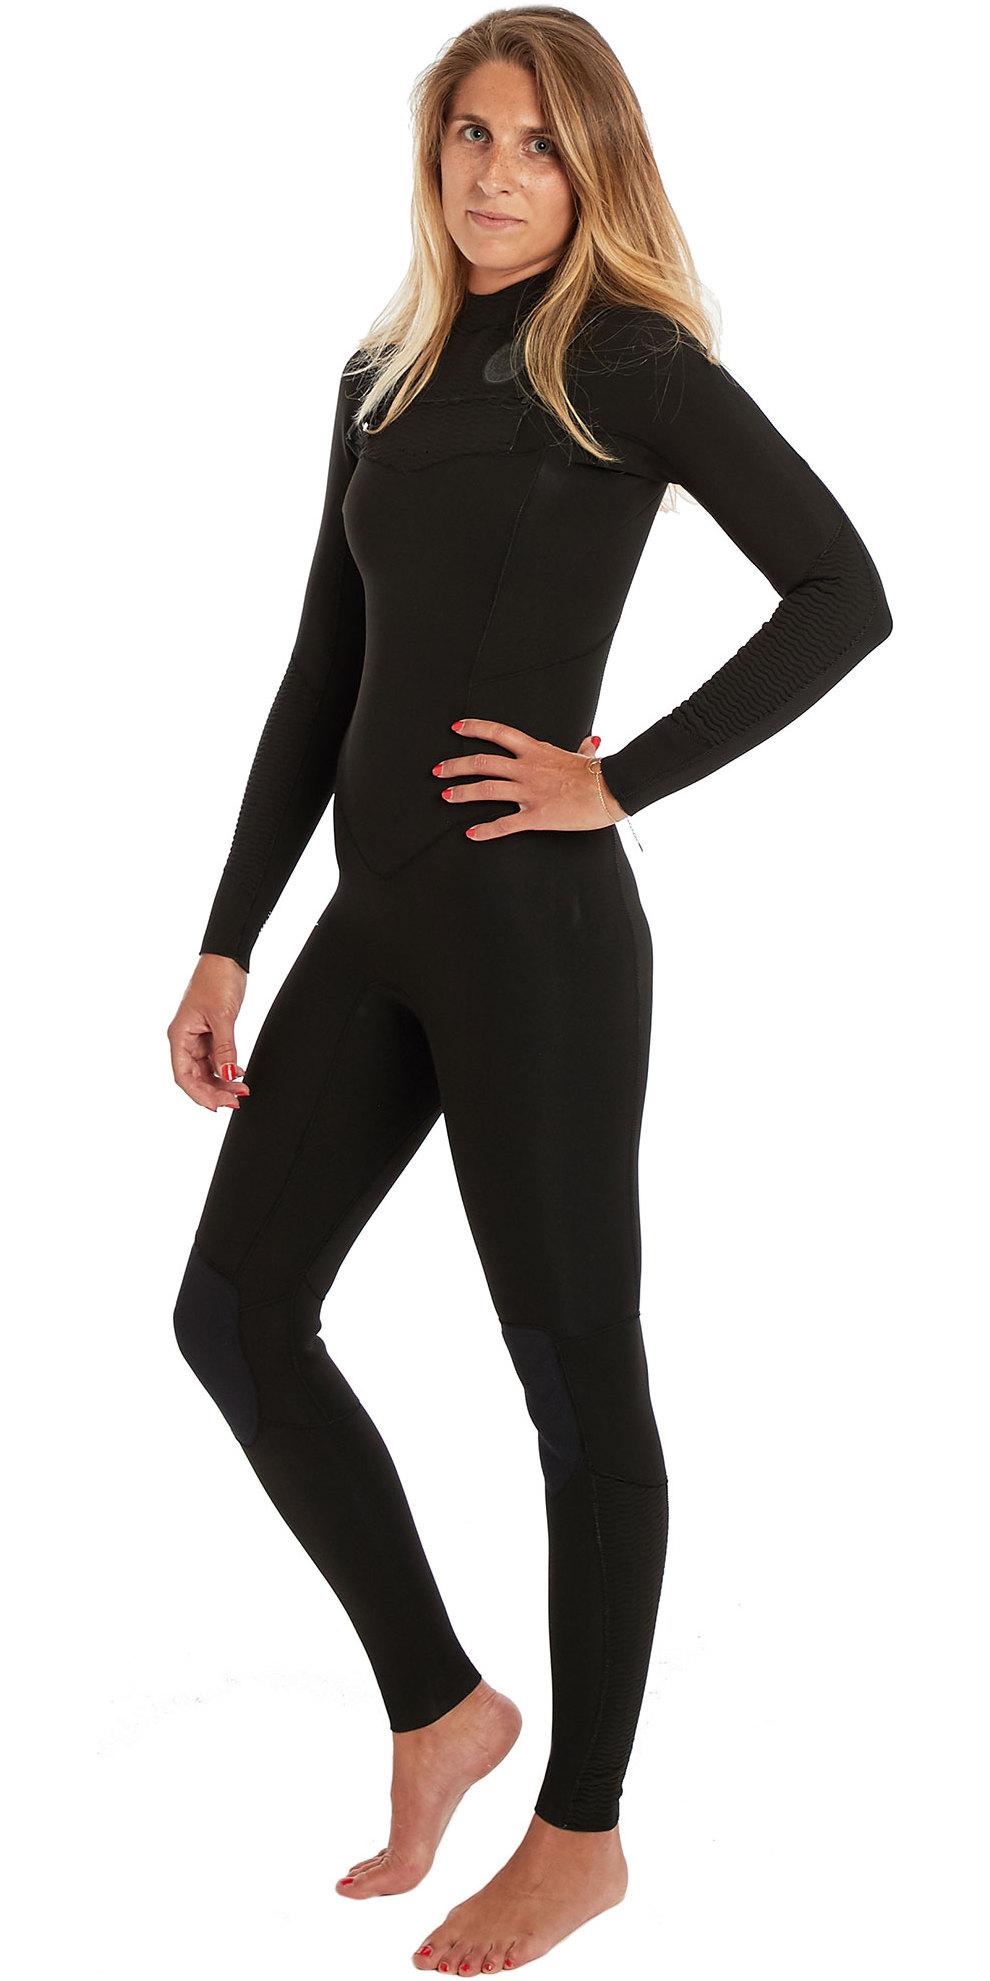 2019 Billabong Womens Salty Dayz 3 2mm Chest Zip Wetsuit Wave N43g30 -  N43g30 - Womens - 3mm Wetsuits  7d402c249